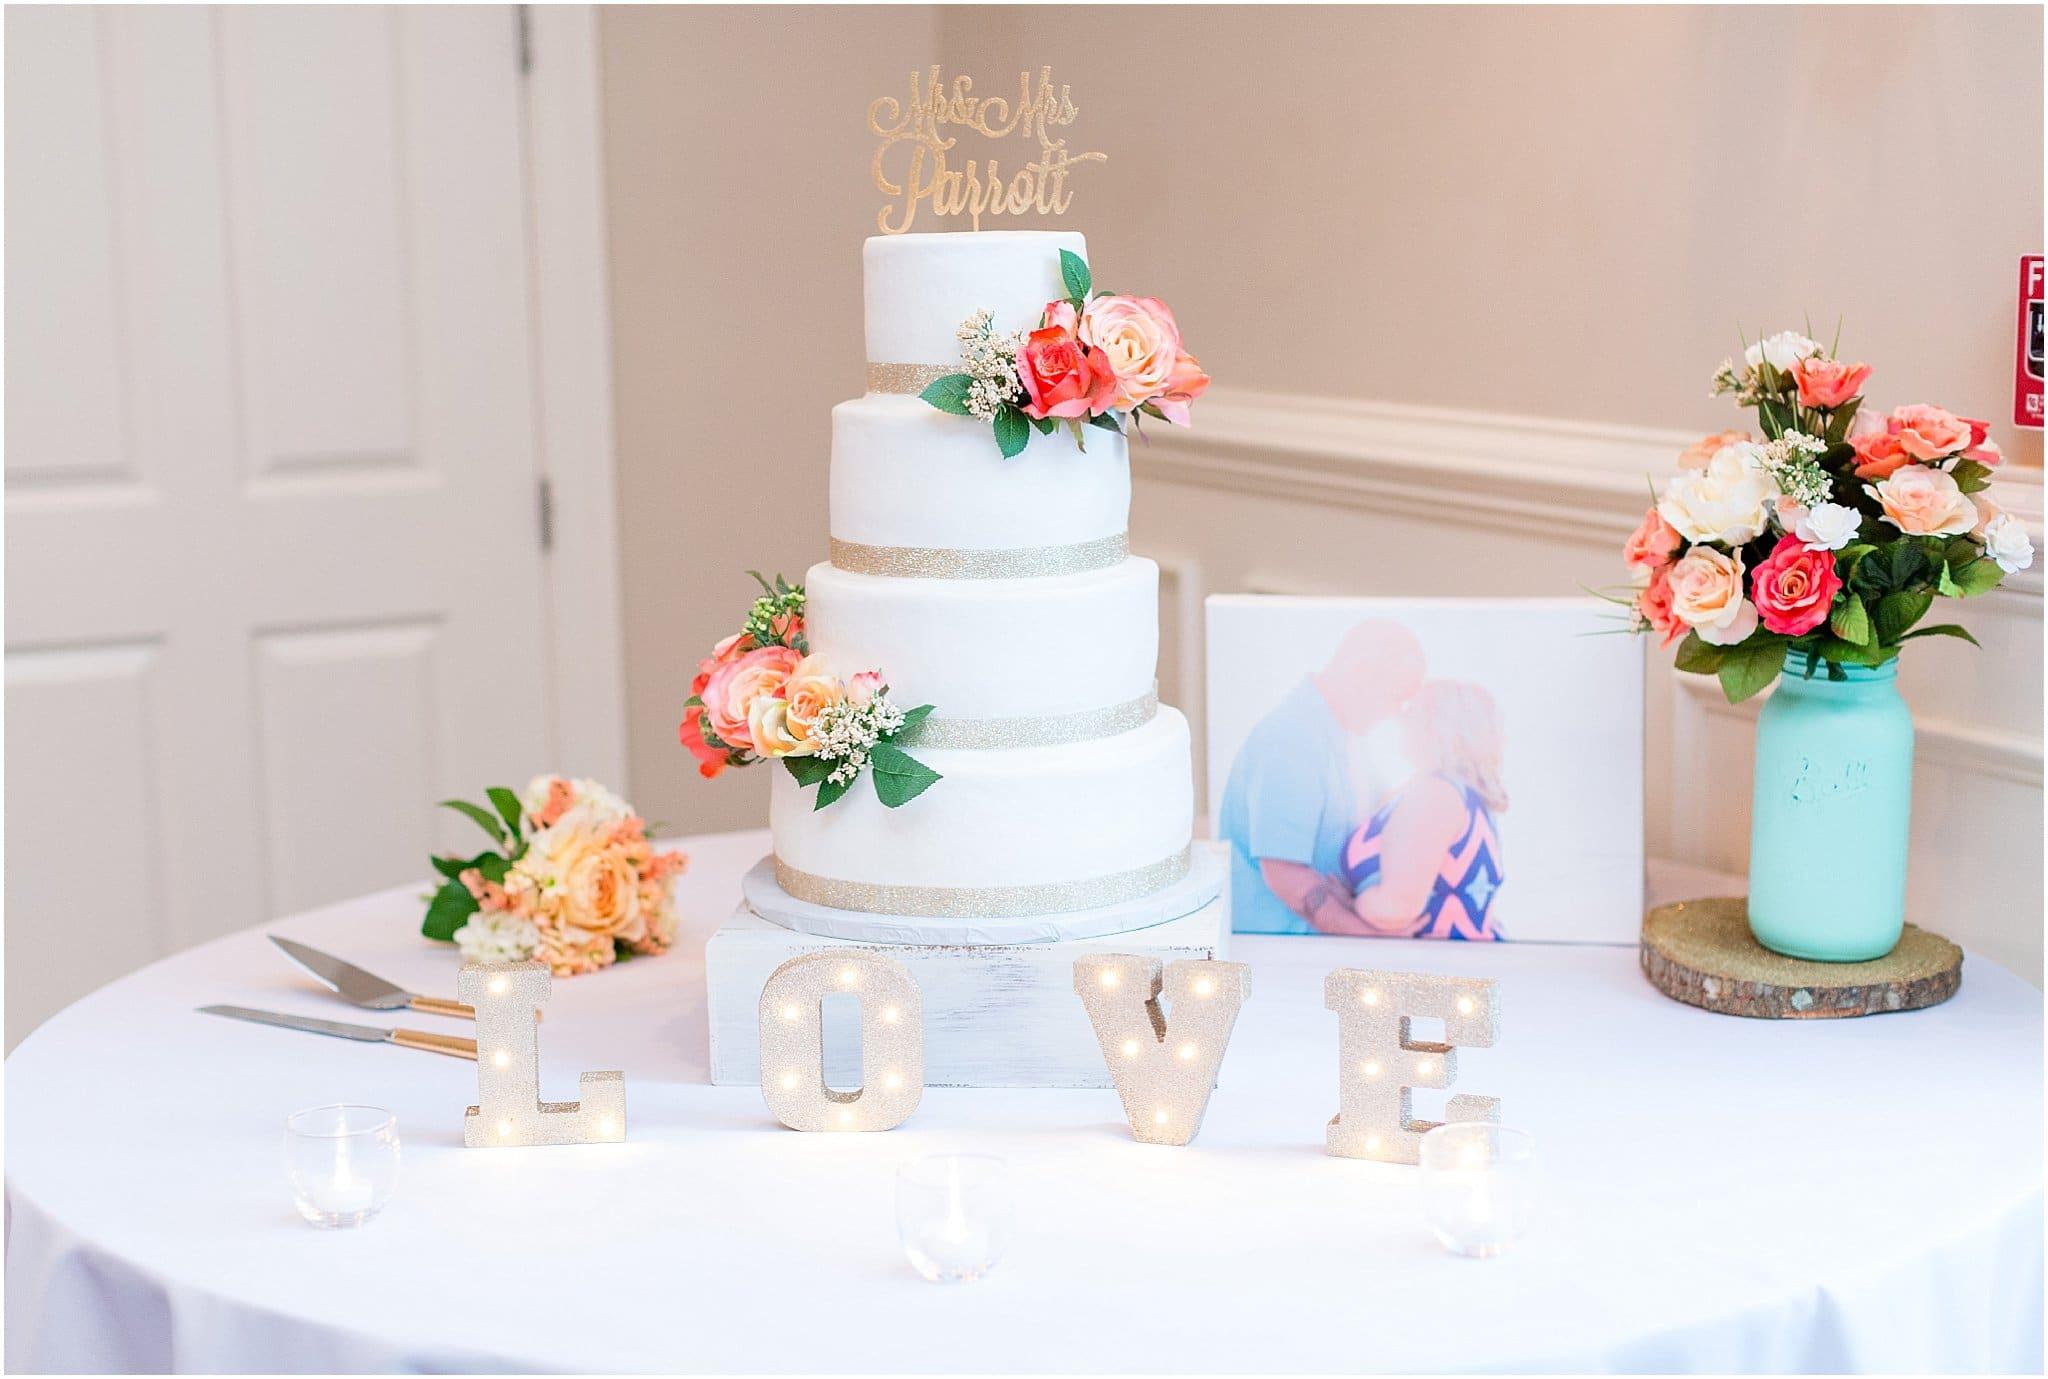 jessscott-milsboro-delaware-wedding-cassidymrphotography_0048